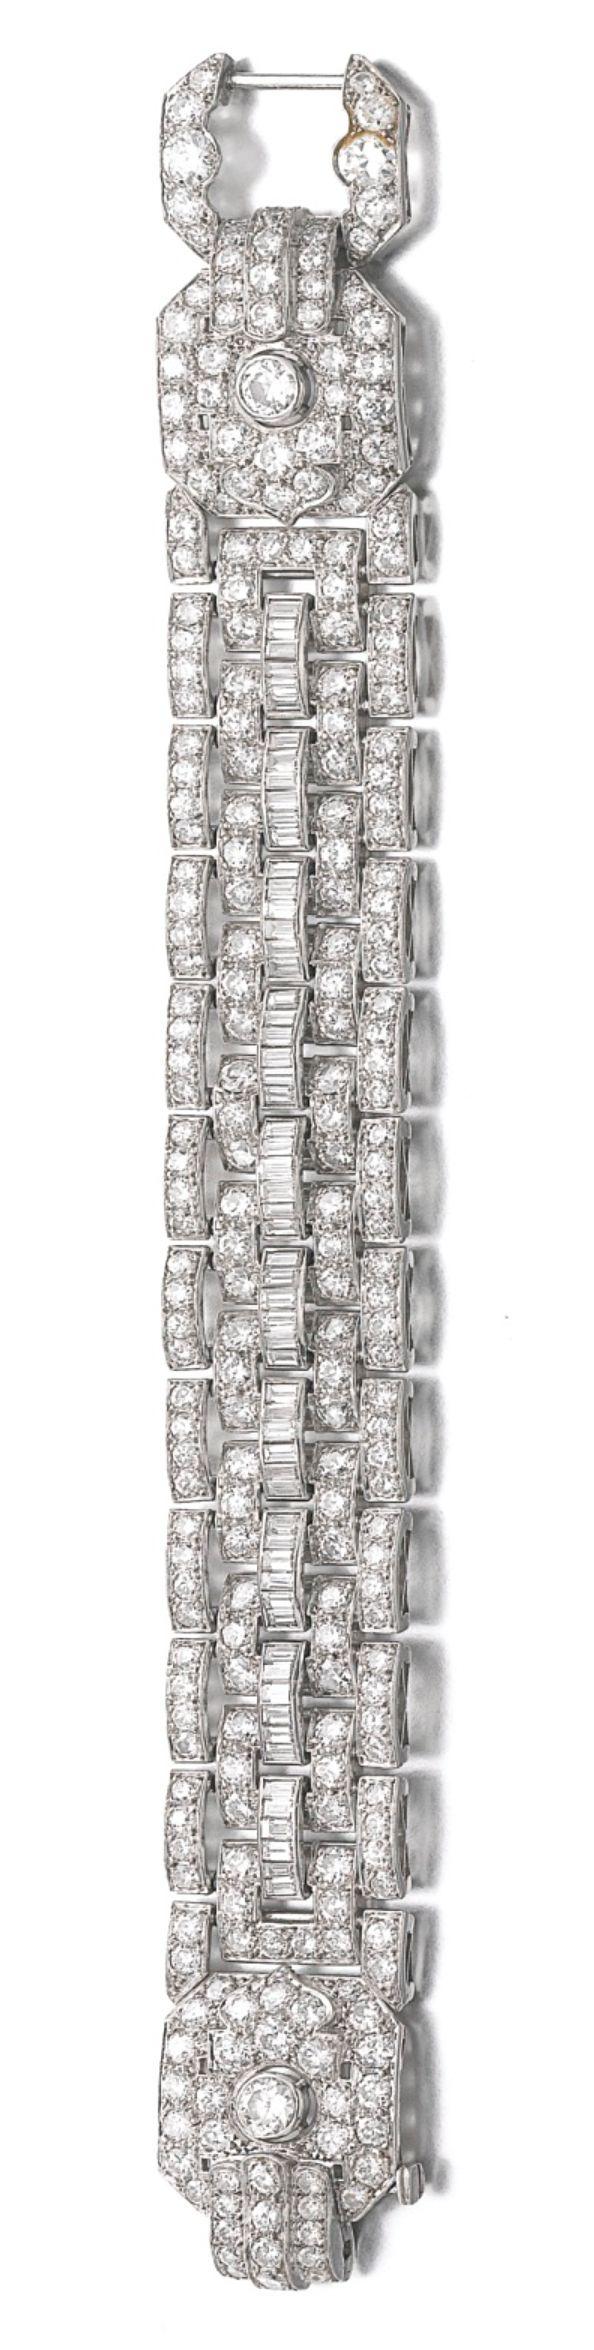 Diamond Bracelets : Diamond Bracelet, circa 1930s. The articulated band of brick links set w/ circul…